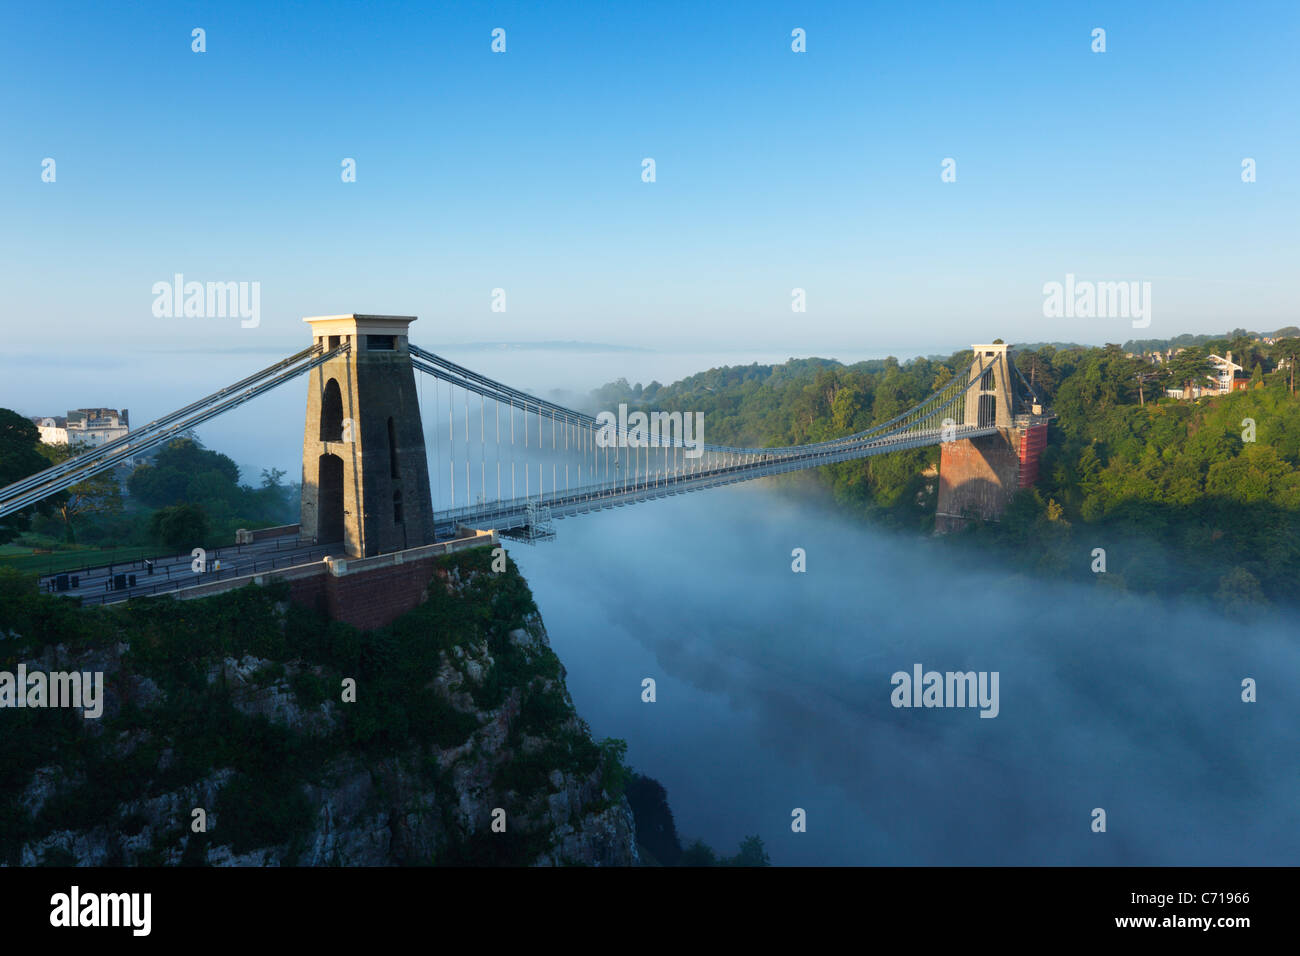 Morning mist in the Avon Gorge at Clifton Suspension Bridge. Bristol. England. UK. - Stock Image